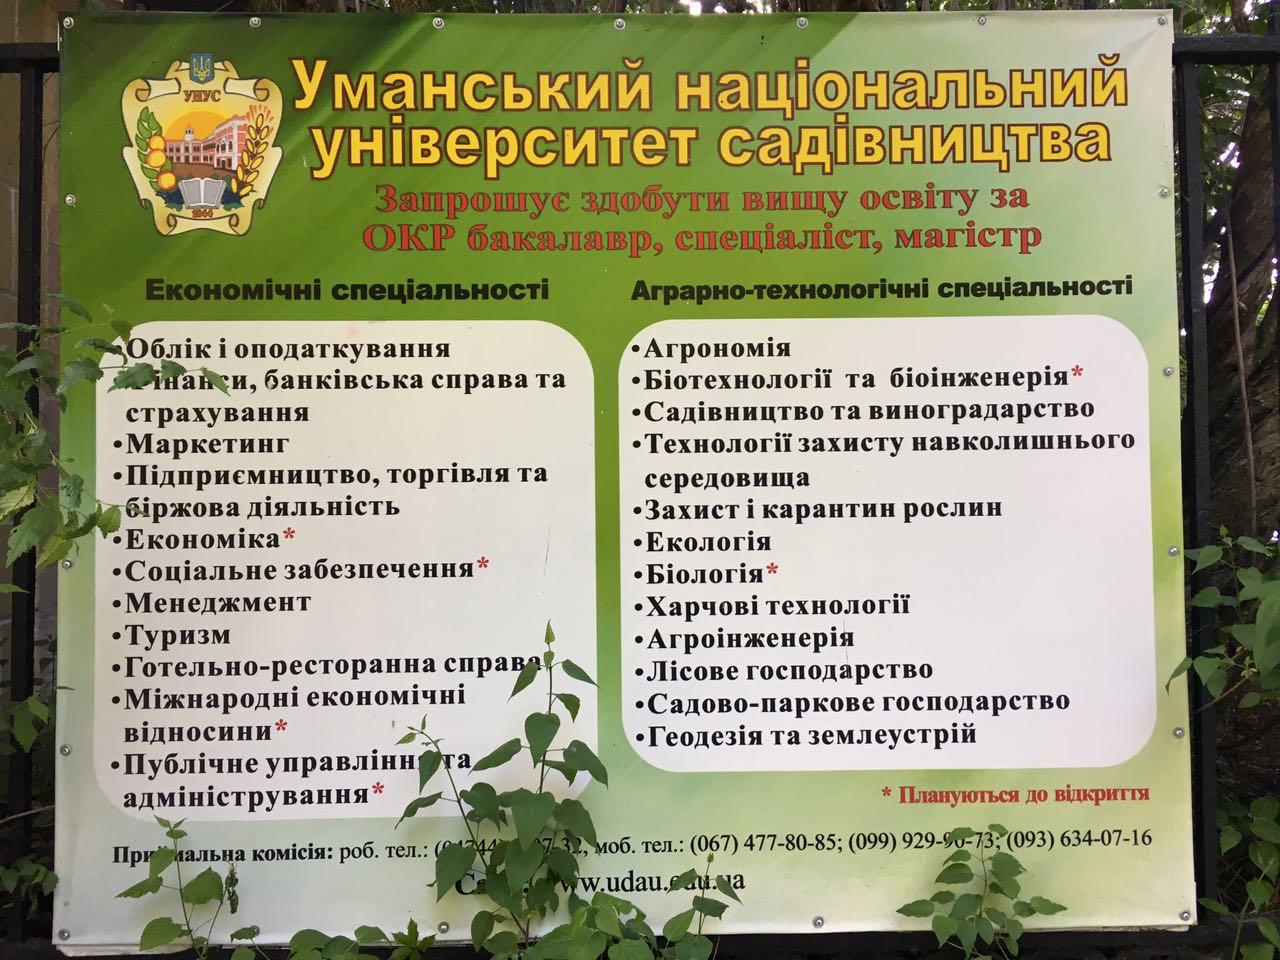 Ukrayna üniversiteleri, ukrayna'da üniversite gezisi 2017